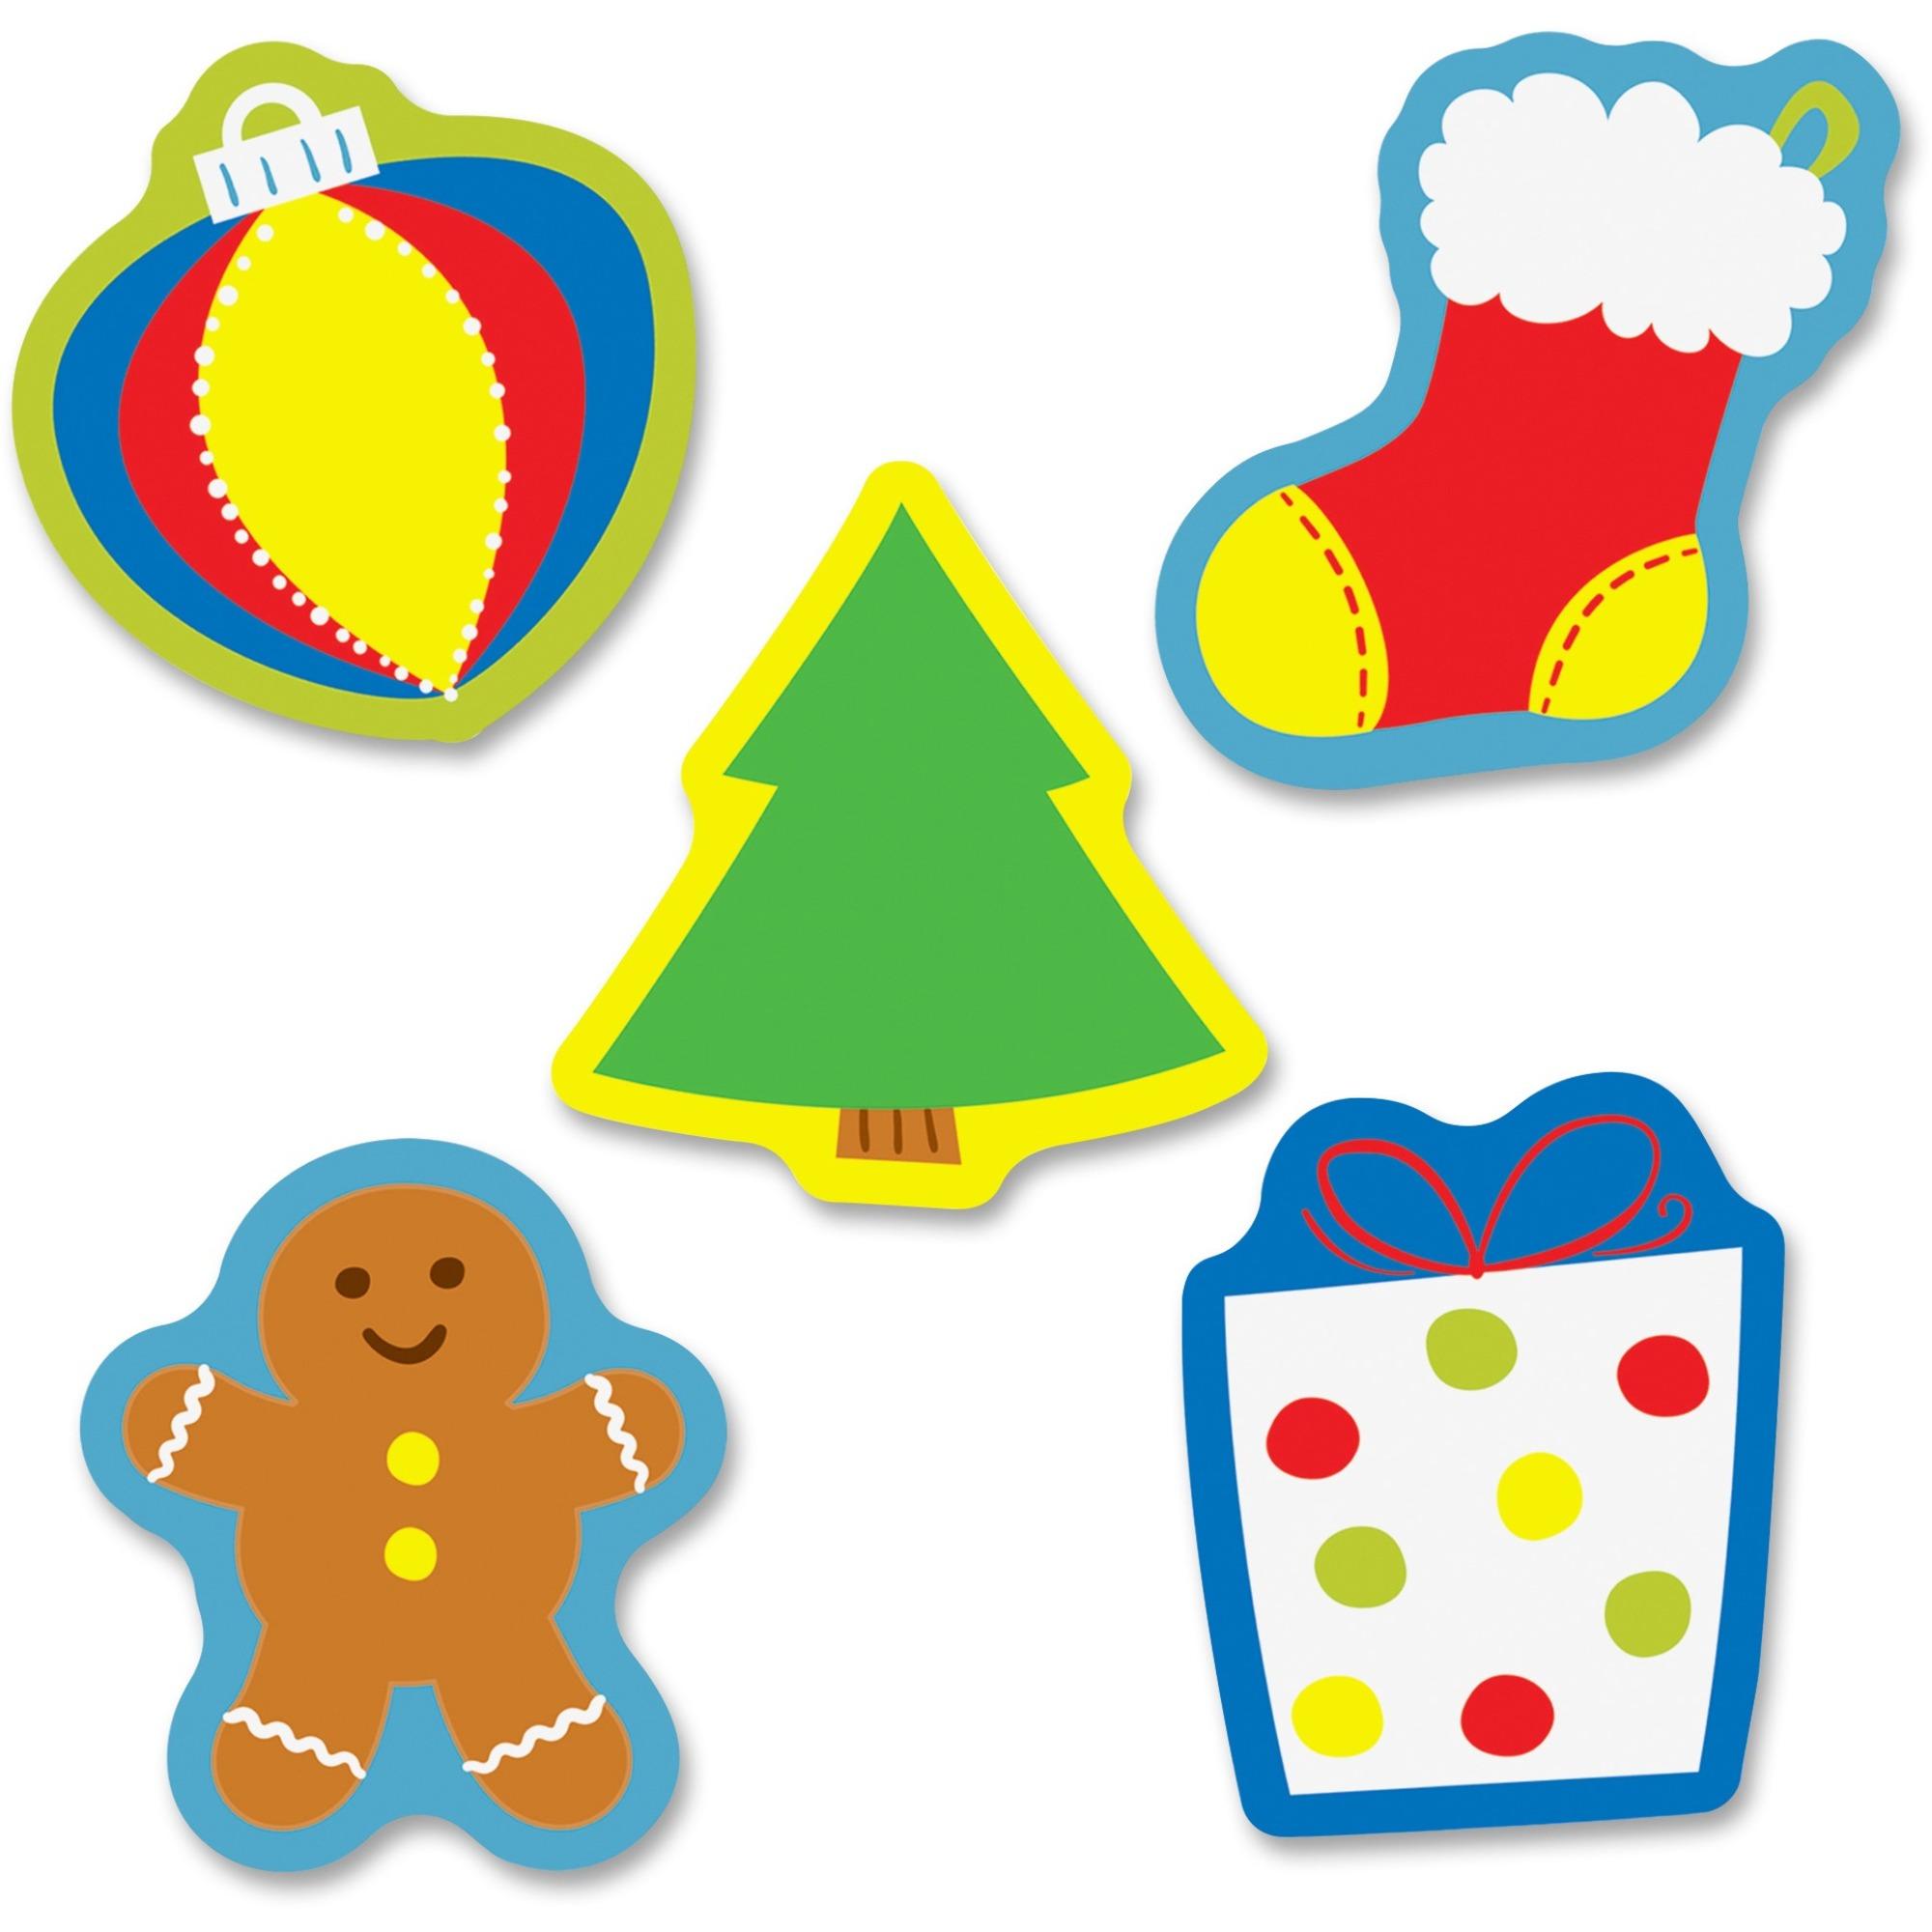 Carson-dellosa Publishing Co., Inc Carson-dellosa Holiday Mix Mini Cut-outs - Learning, Fun Theme/subject - 4, 4, 4, 4, 4, 4, 4, 8, 5 (Stocking, Monster, Blue Light, Gift, Green Light, Yellow Light, Red Light, Ornament, Gingerbread Men) Shape - 3 Width X